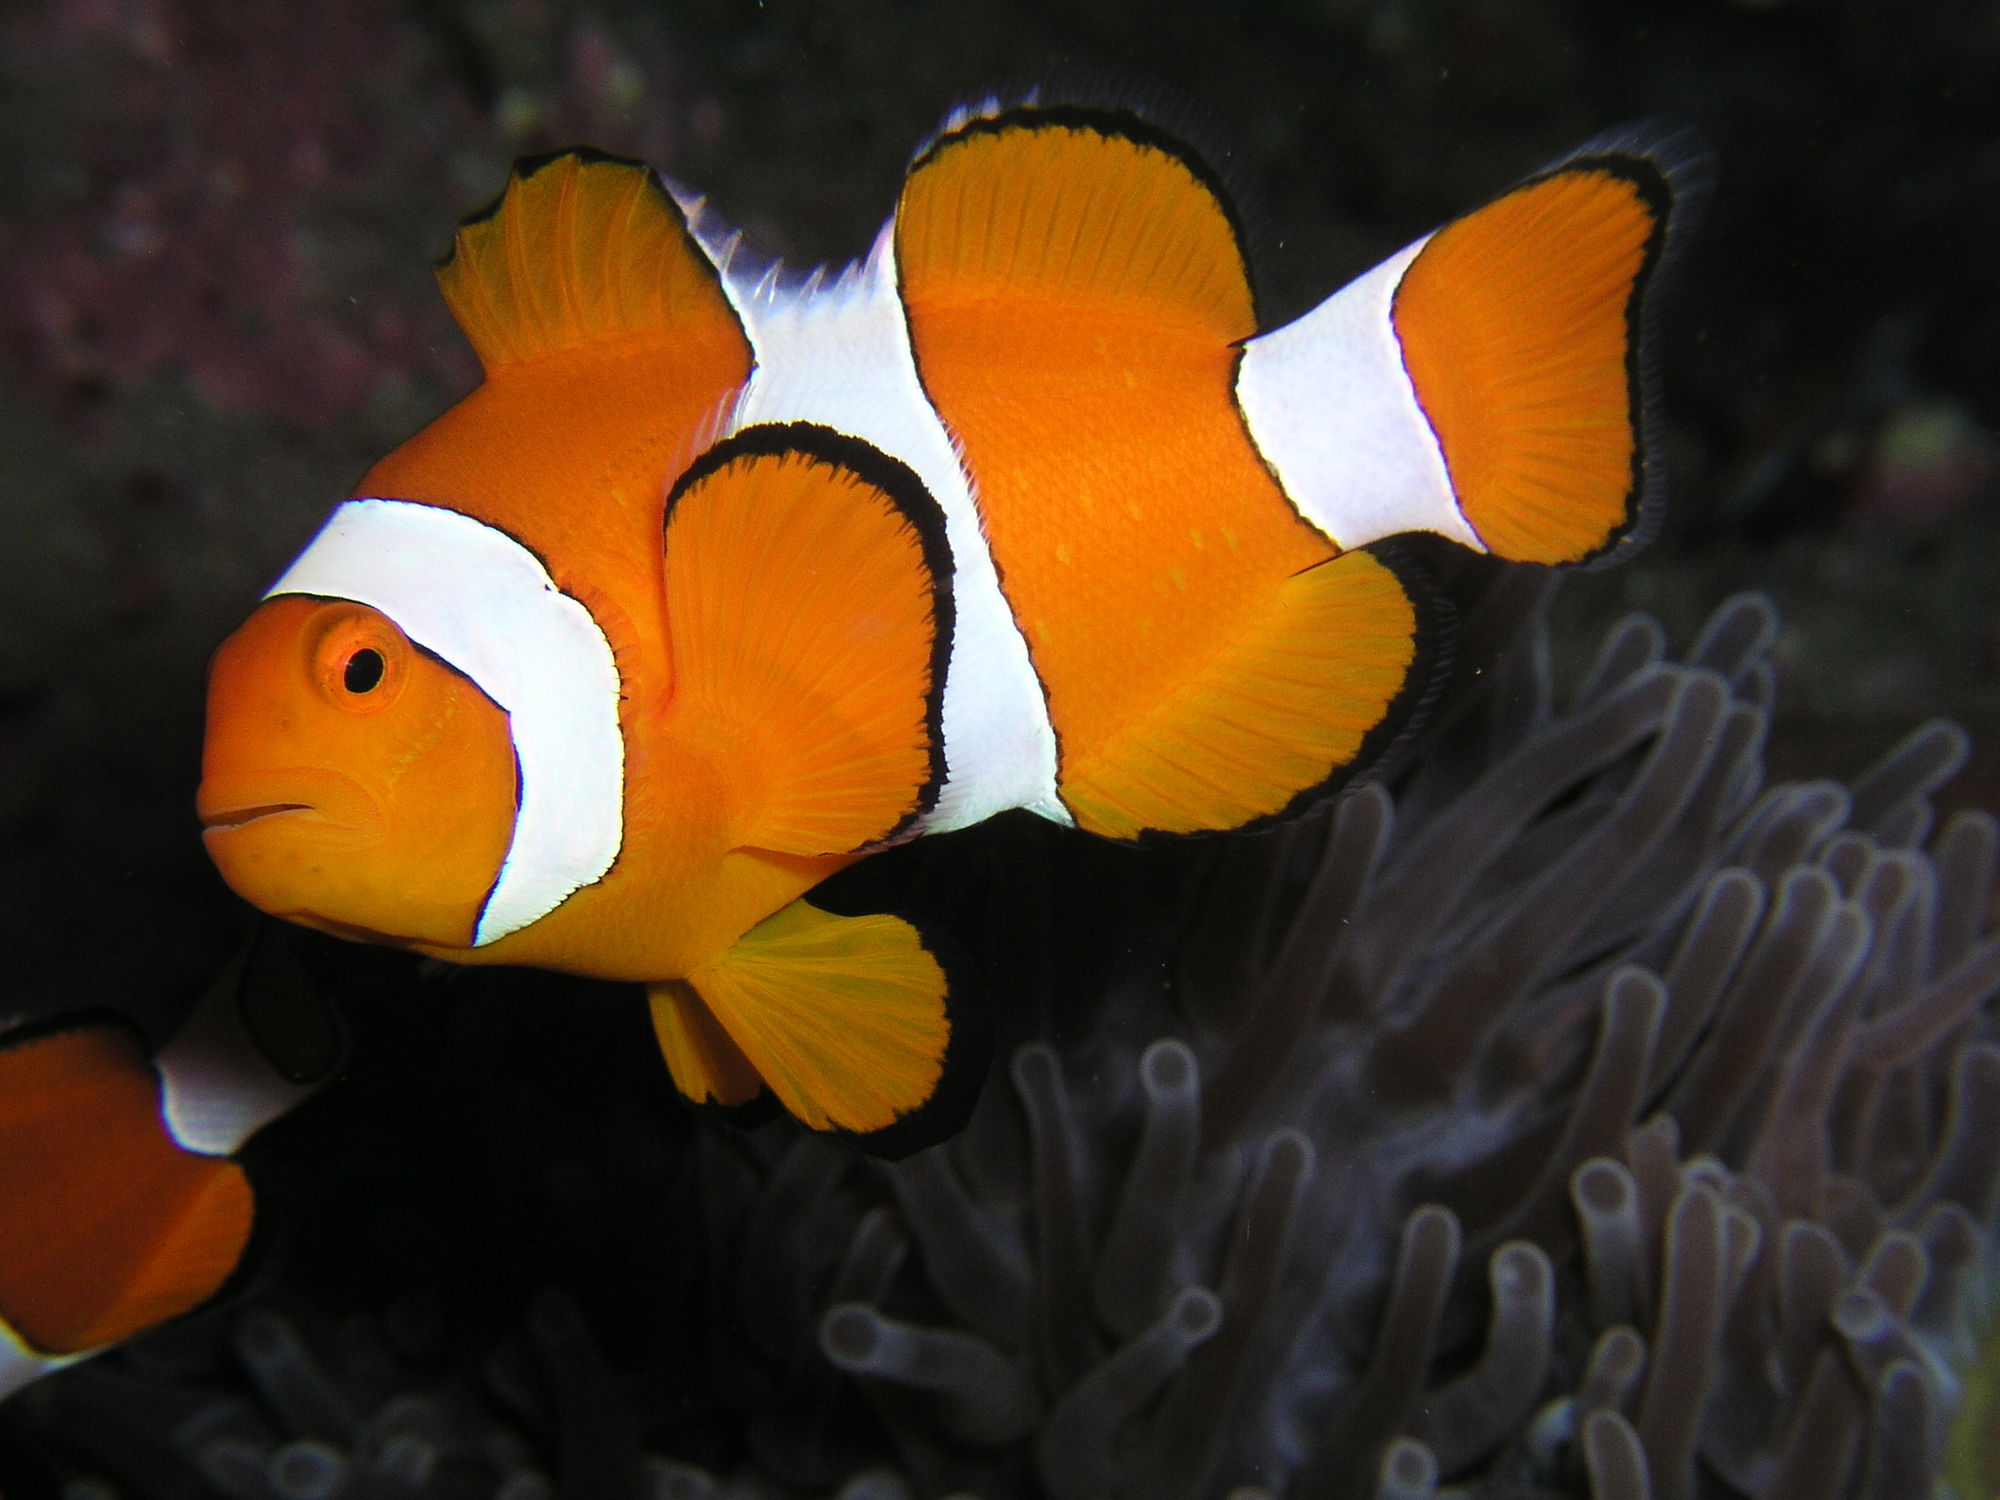 webquest 6 kingdoms classification On pics of clown fish